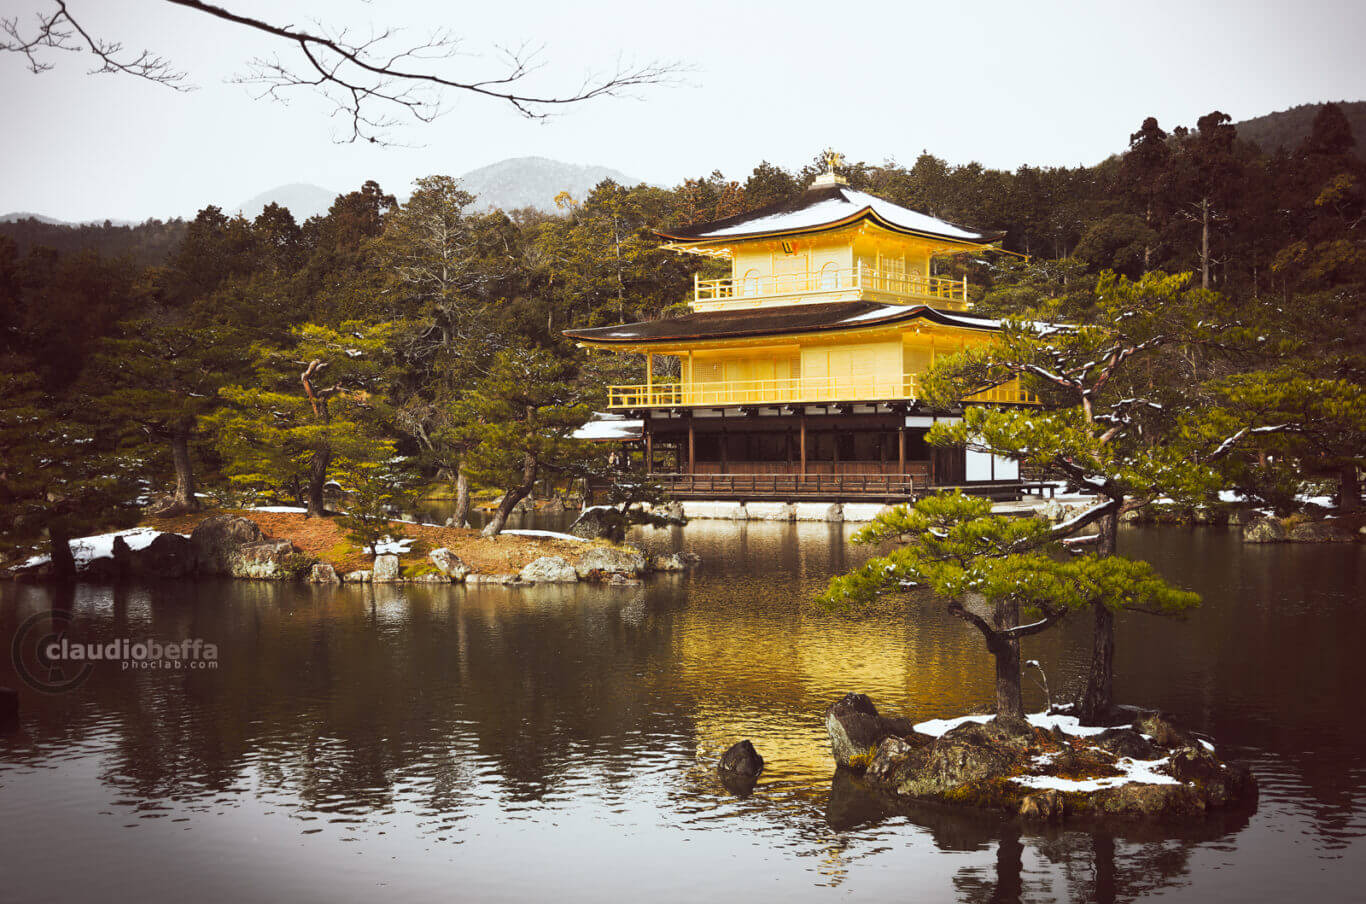 snow on the Kinkakuji, Kinkakuji, Gold, Pavilion, Snow, Winter, Kyoto, Japan, Pond, Water, Trees, Reflections, Travel